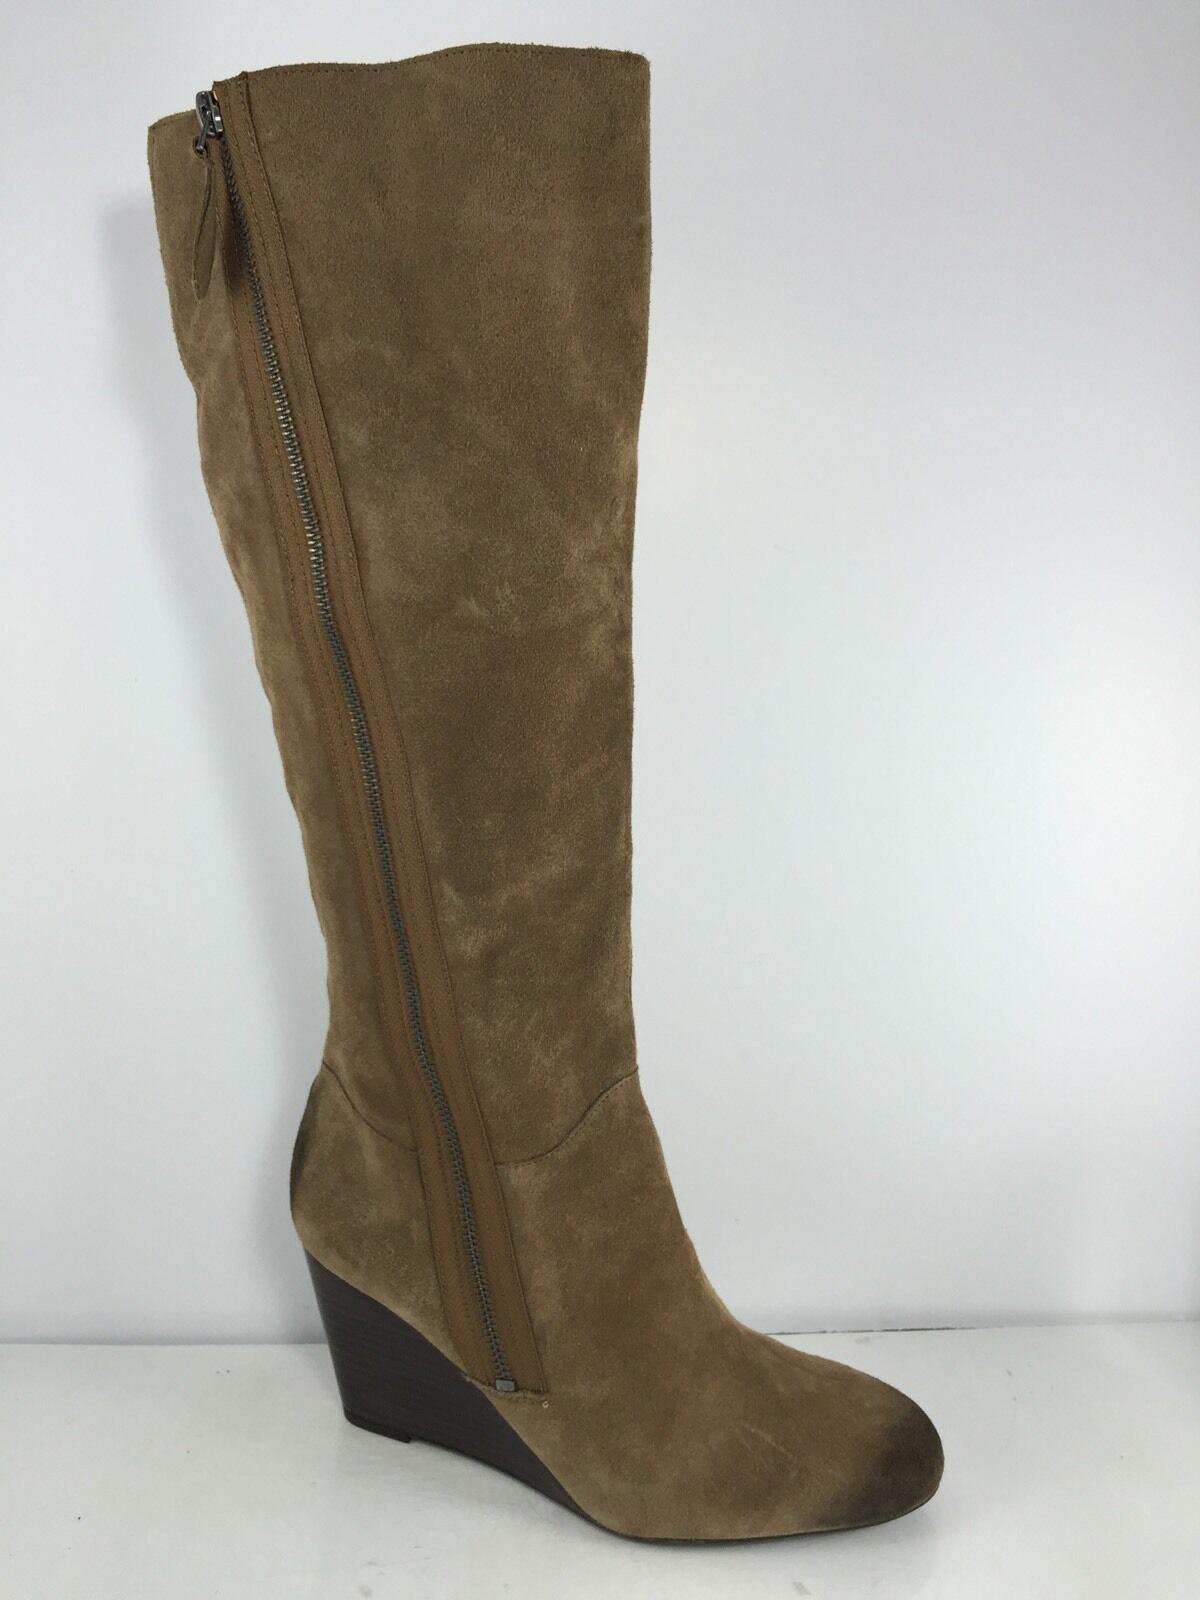 Franco Sarto damen braun braun braun Leather Knee Stiefel 10 M 7d2c02